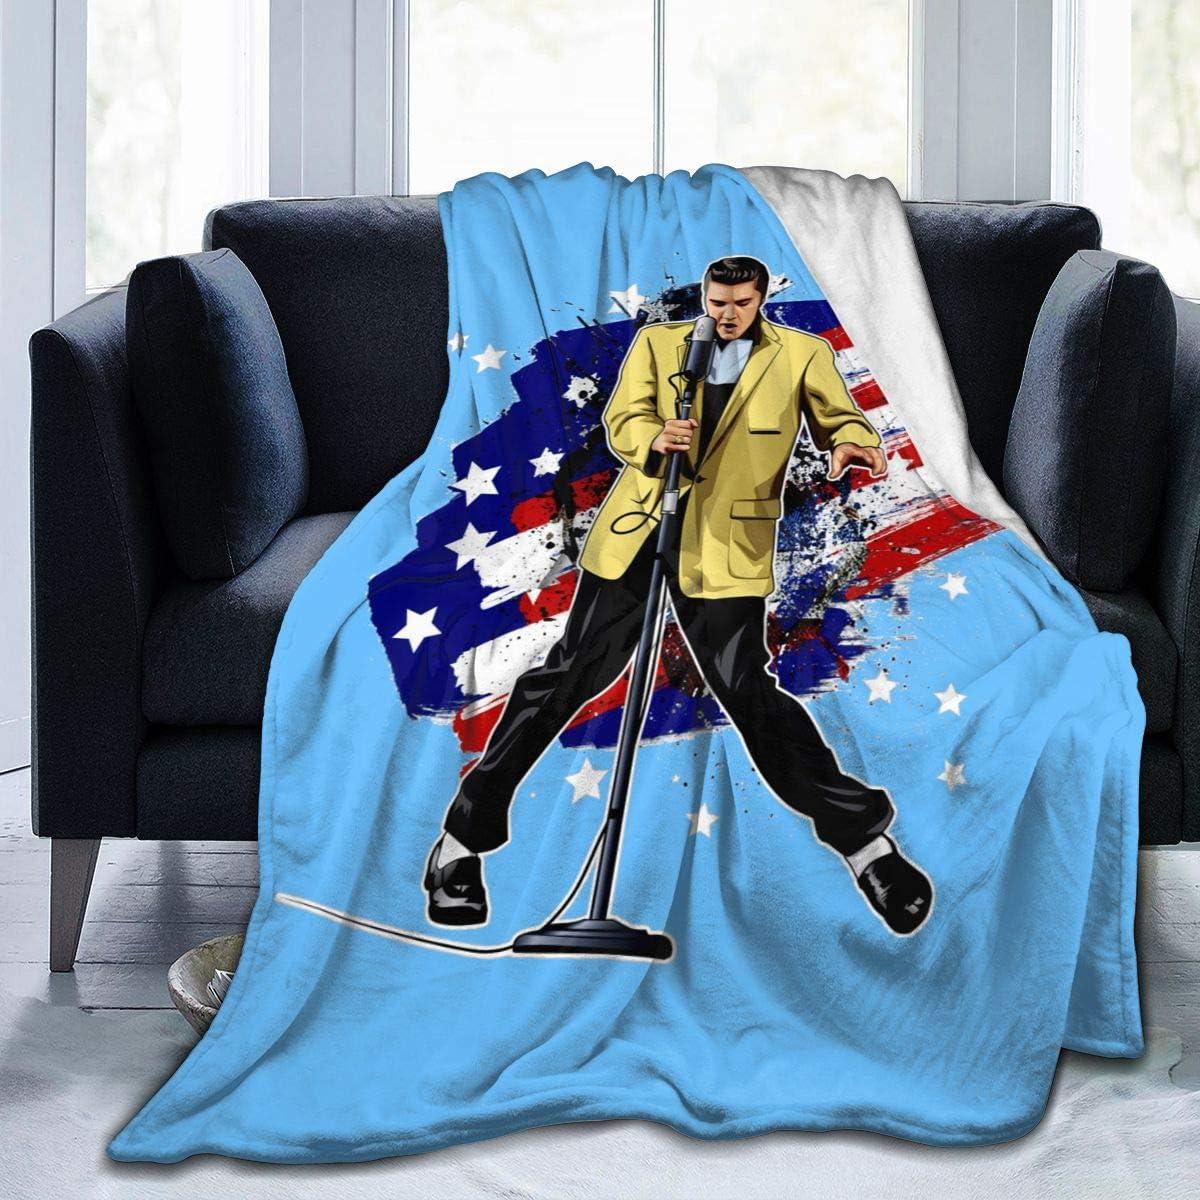 Elvis Presley Soft and Warm Throw Blanket